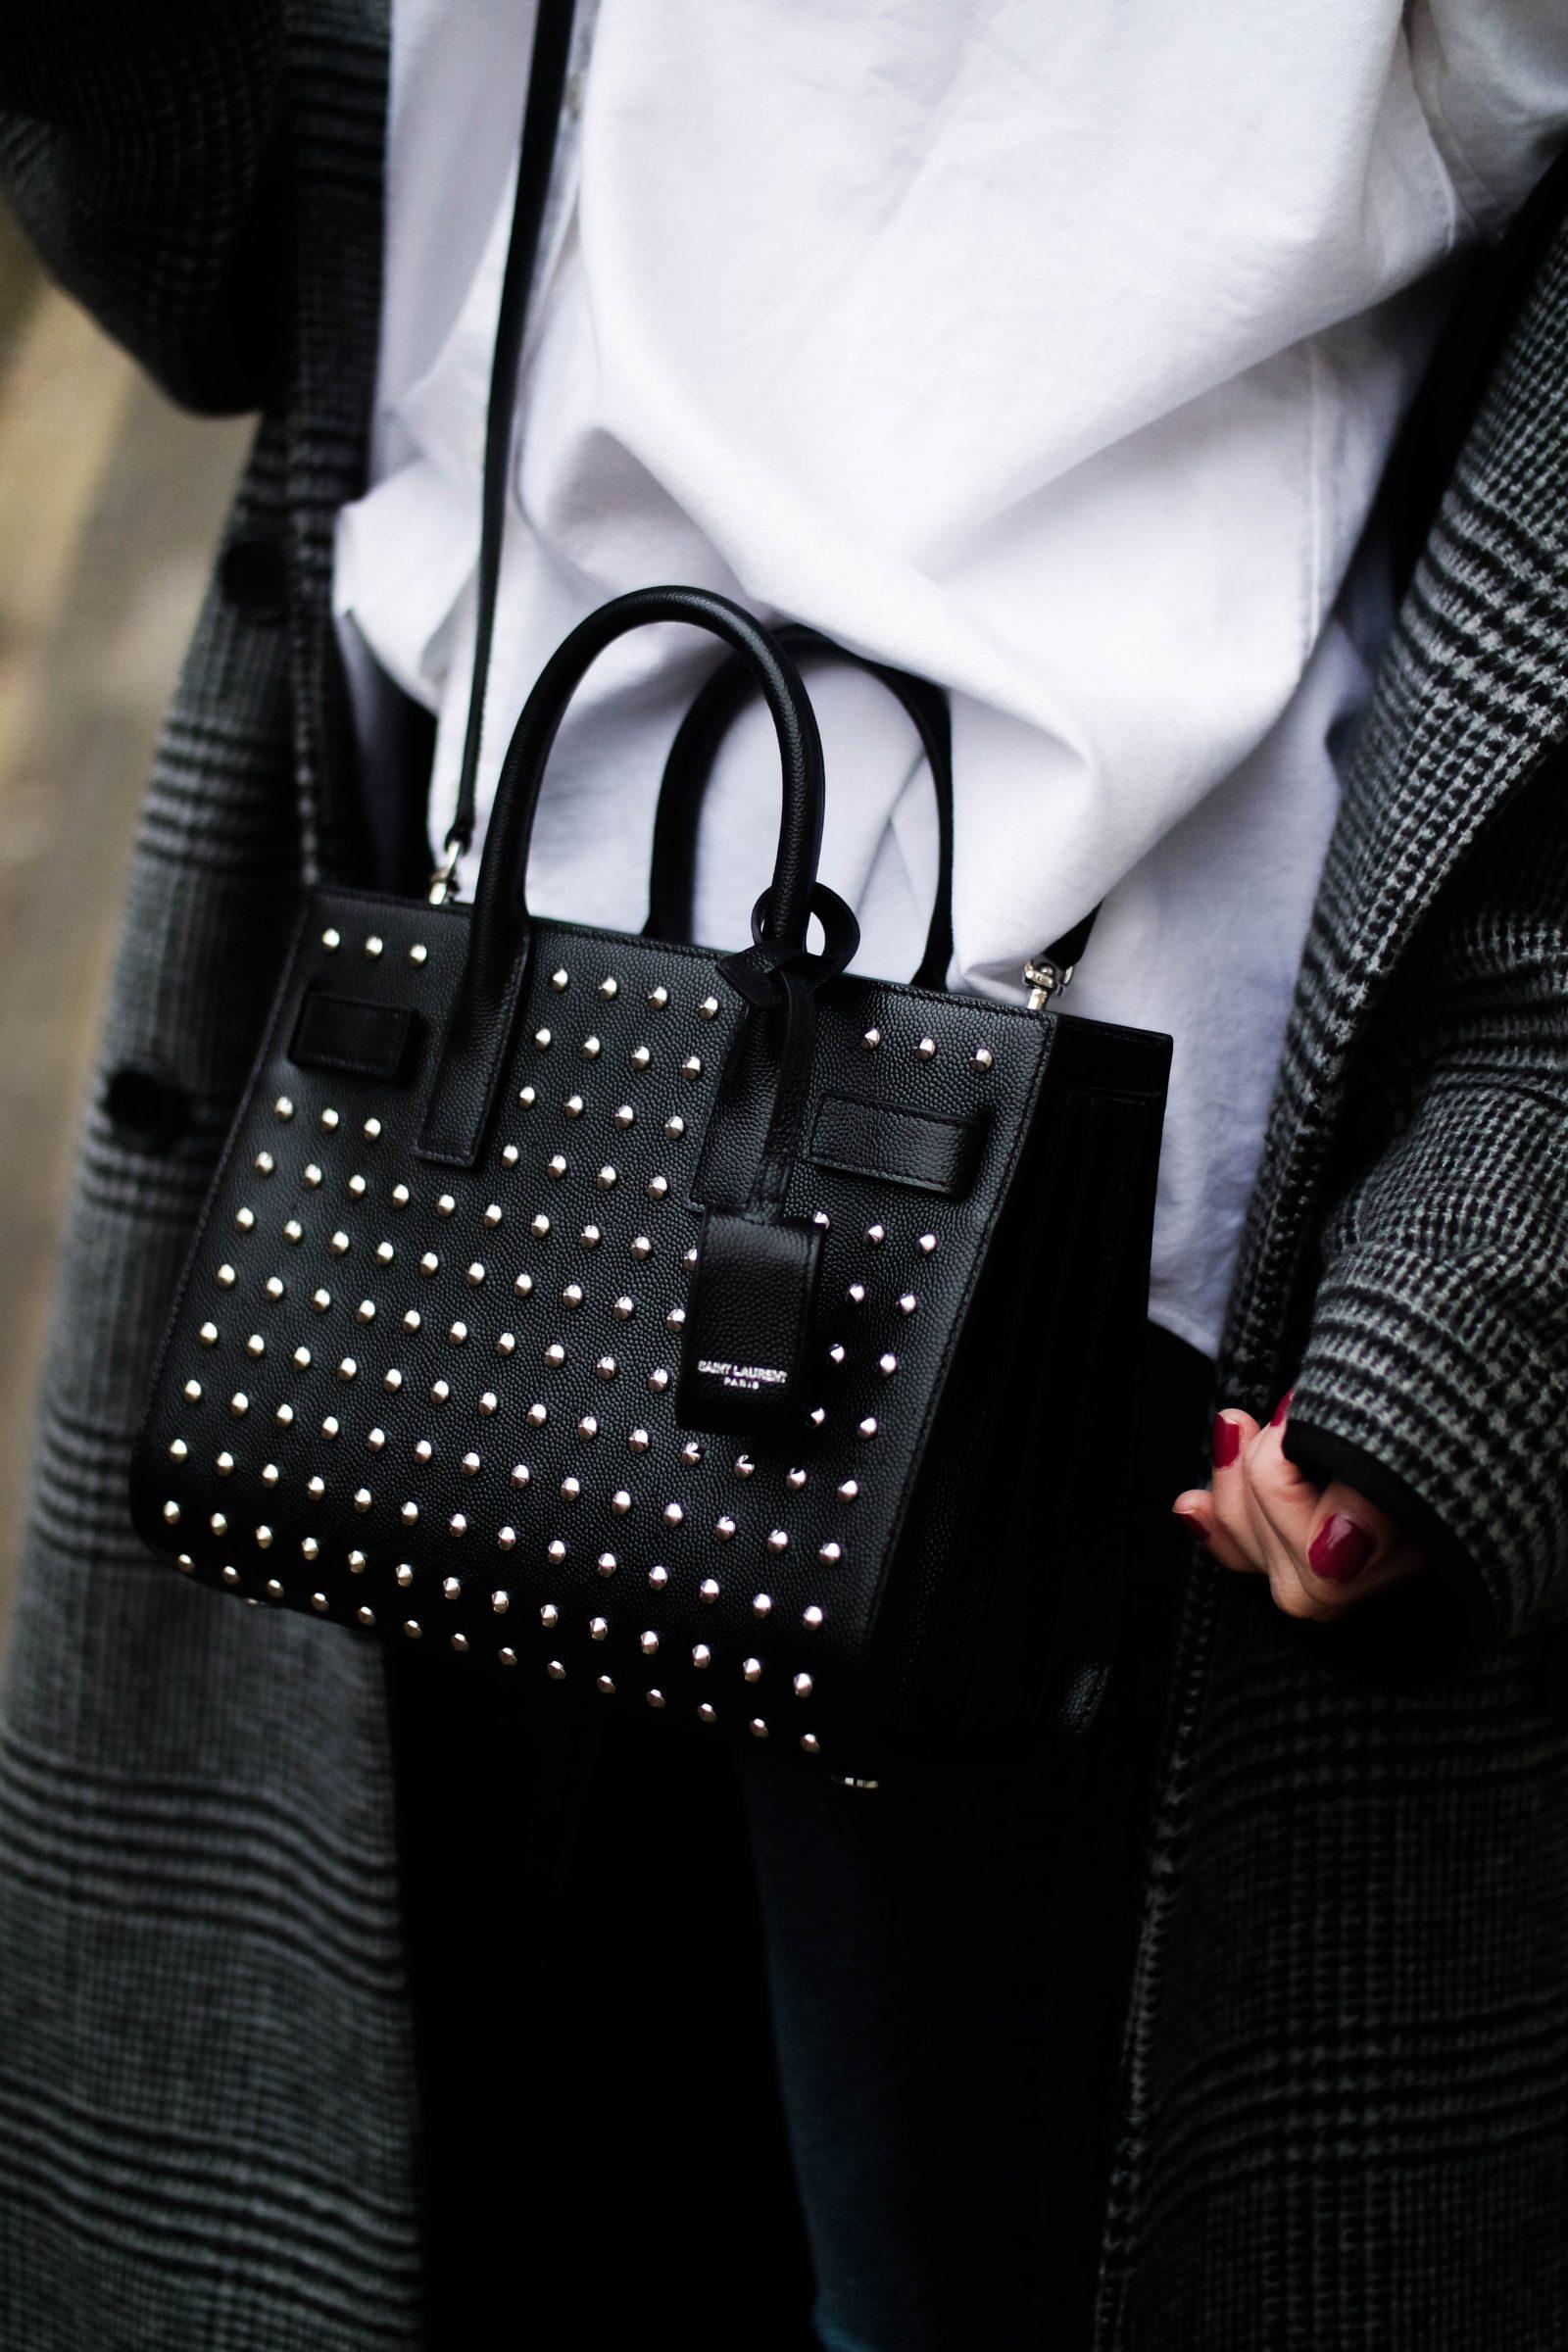 Say Hello To Saint (laurent) - YSL Bag